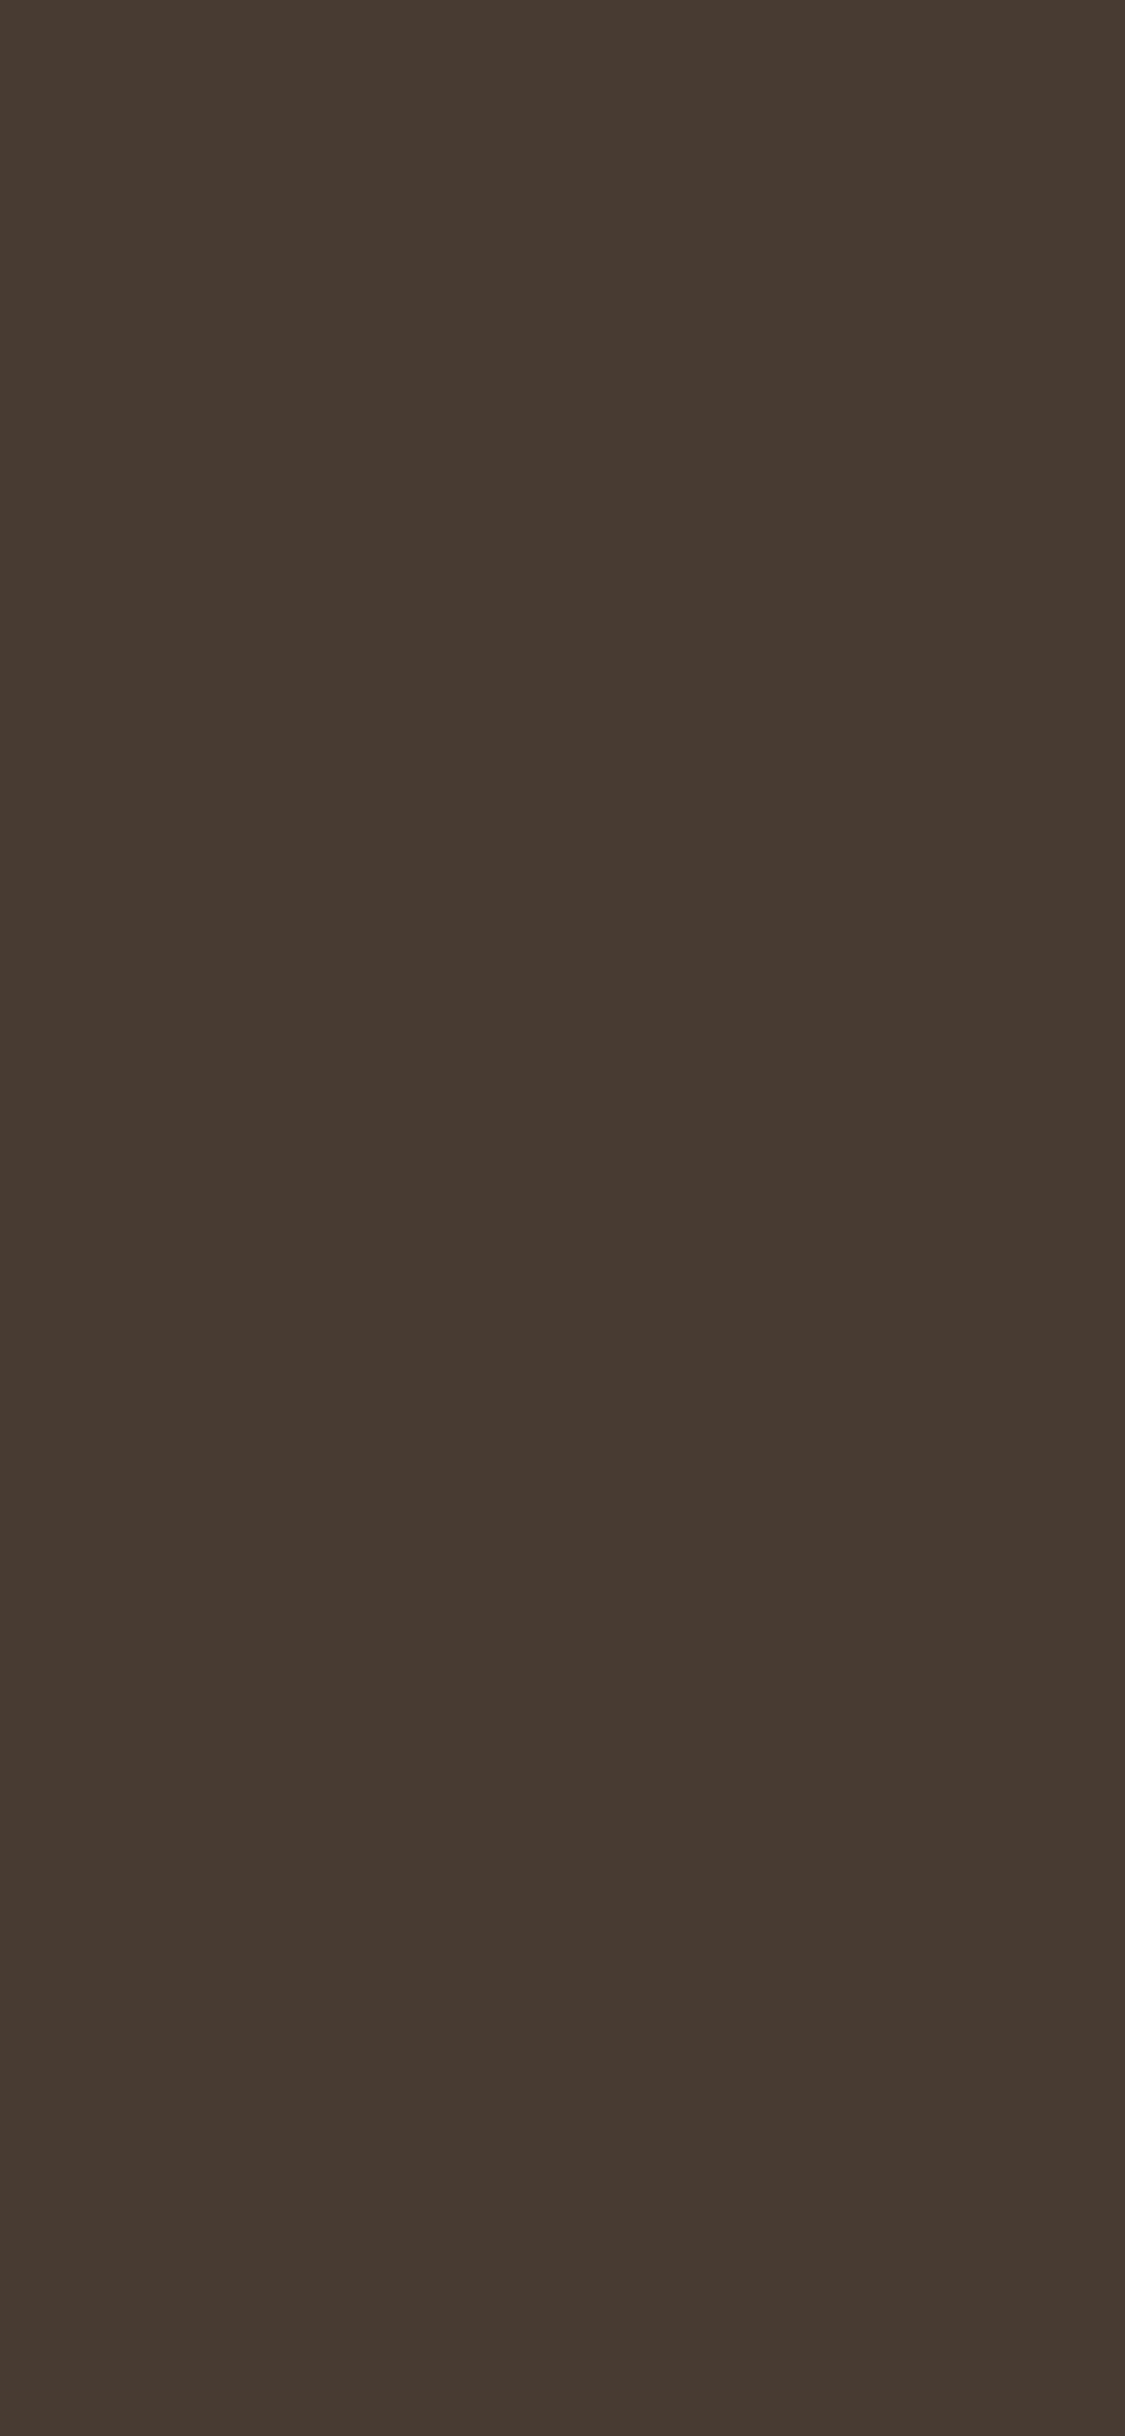 1125x2436 Dark Lava Solid Color Background